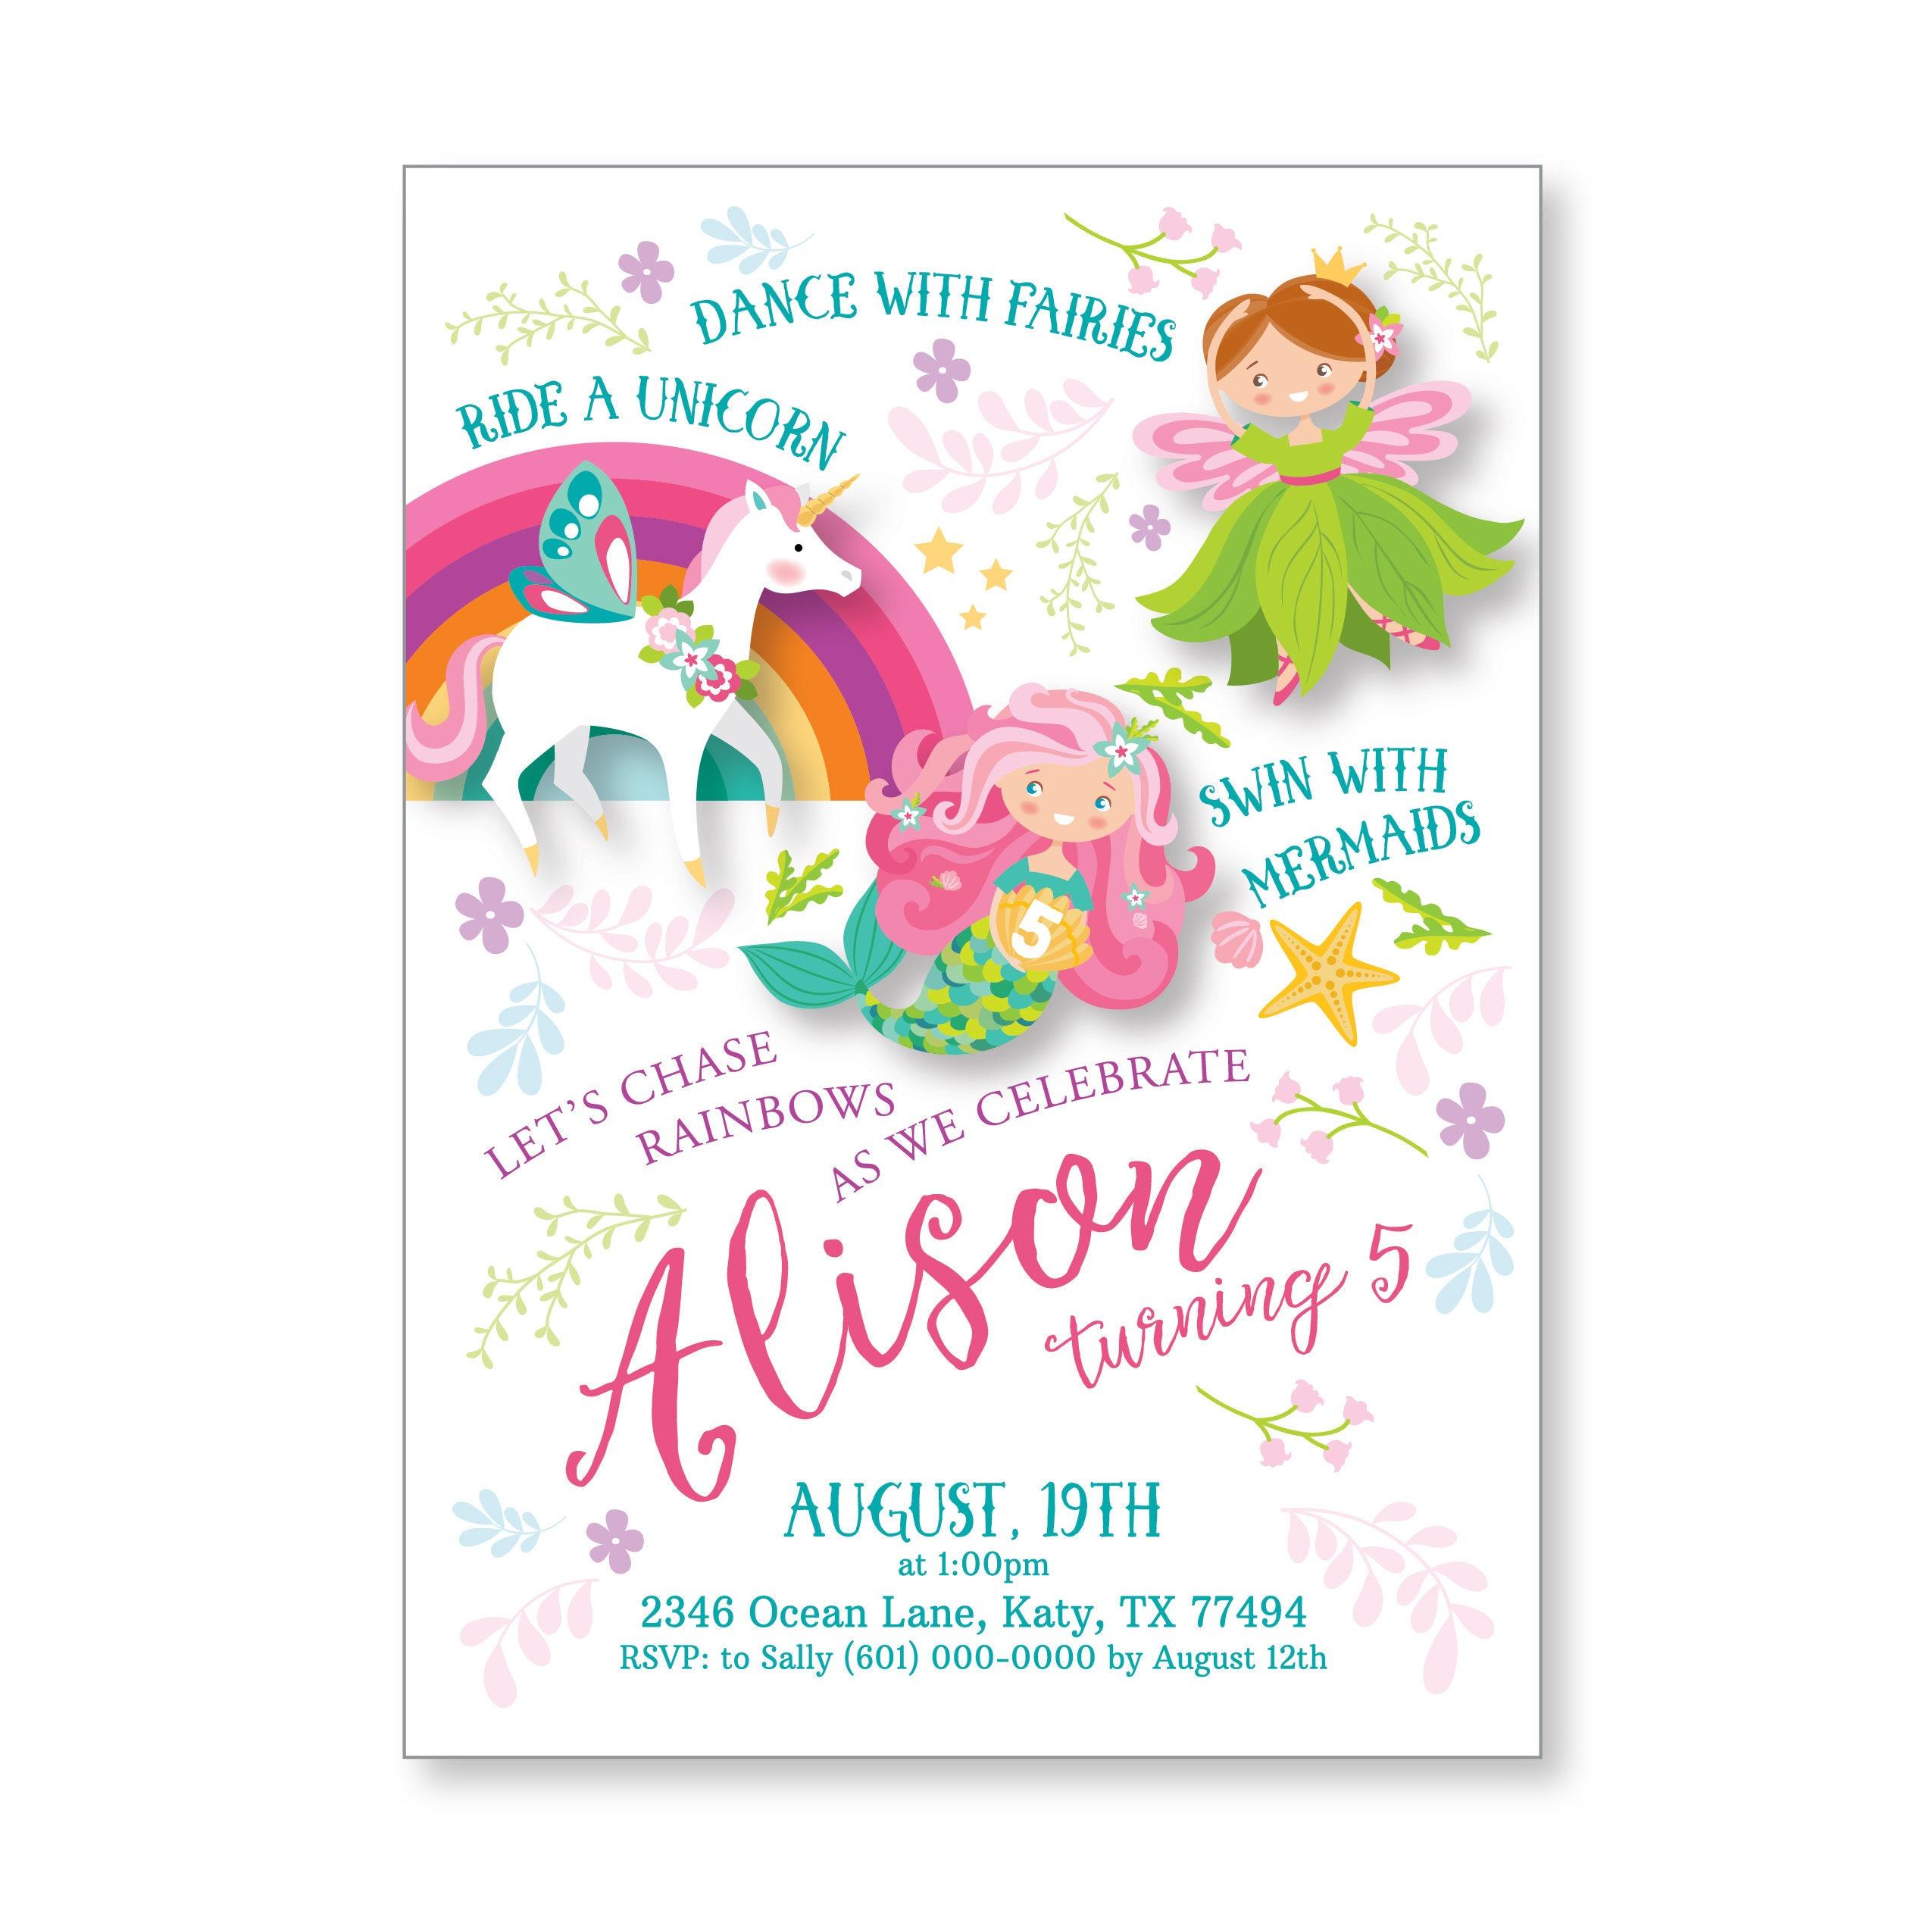 Unicorn, Mermaid, Fairy Invitation - Girls Birthday Invitations ...